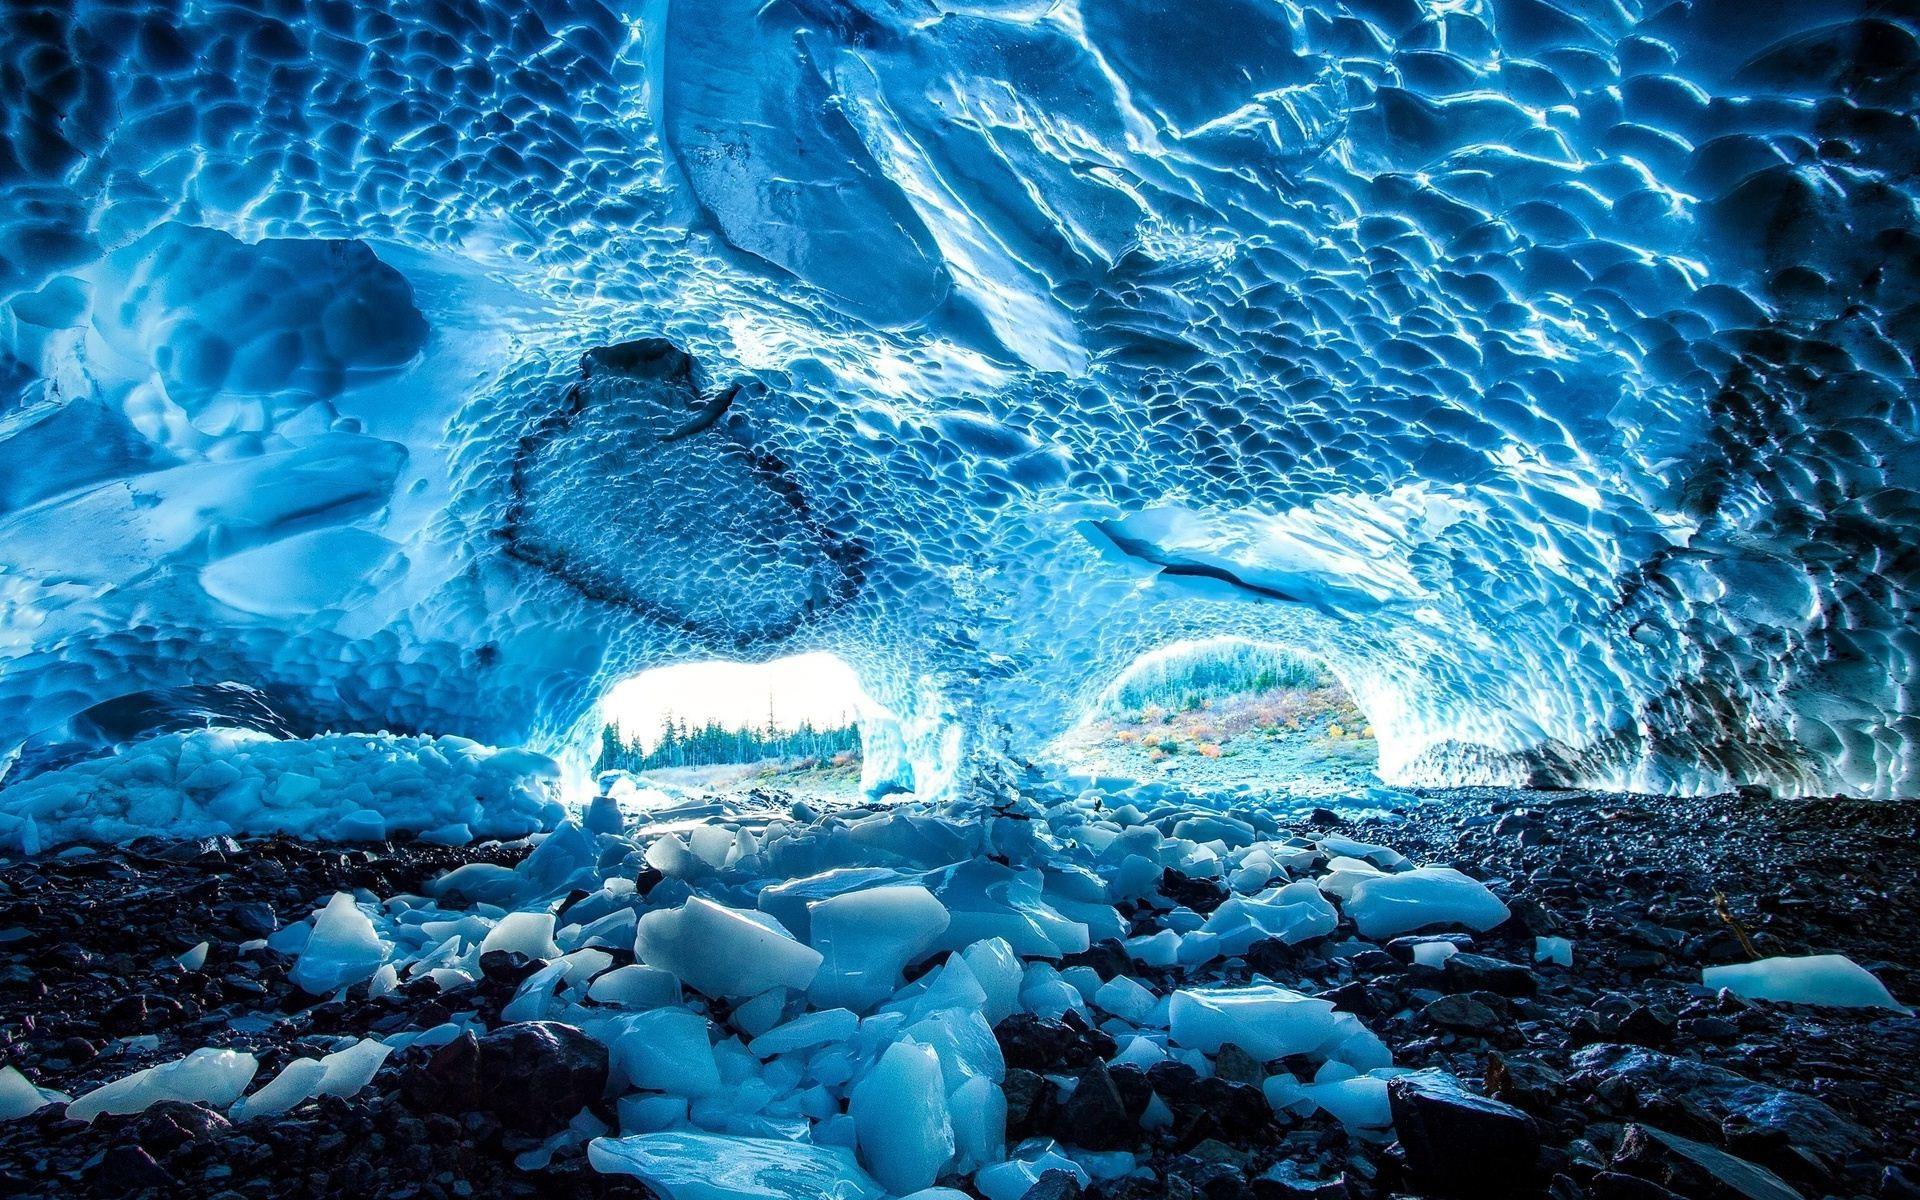 blue ice wallpaper - photo #24